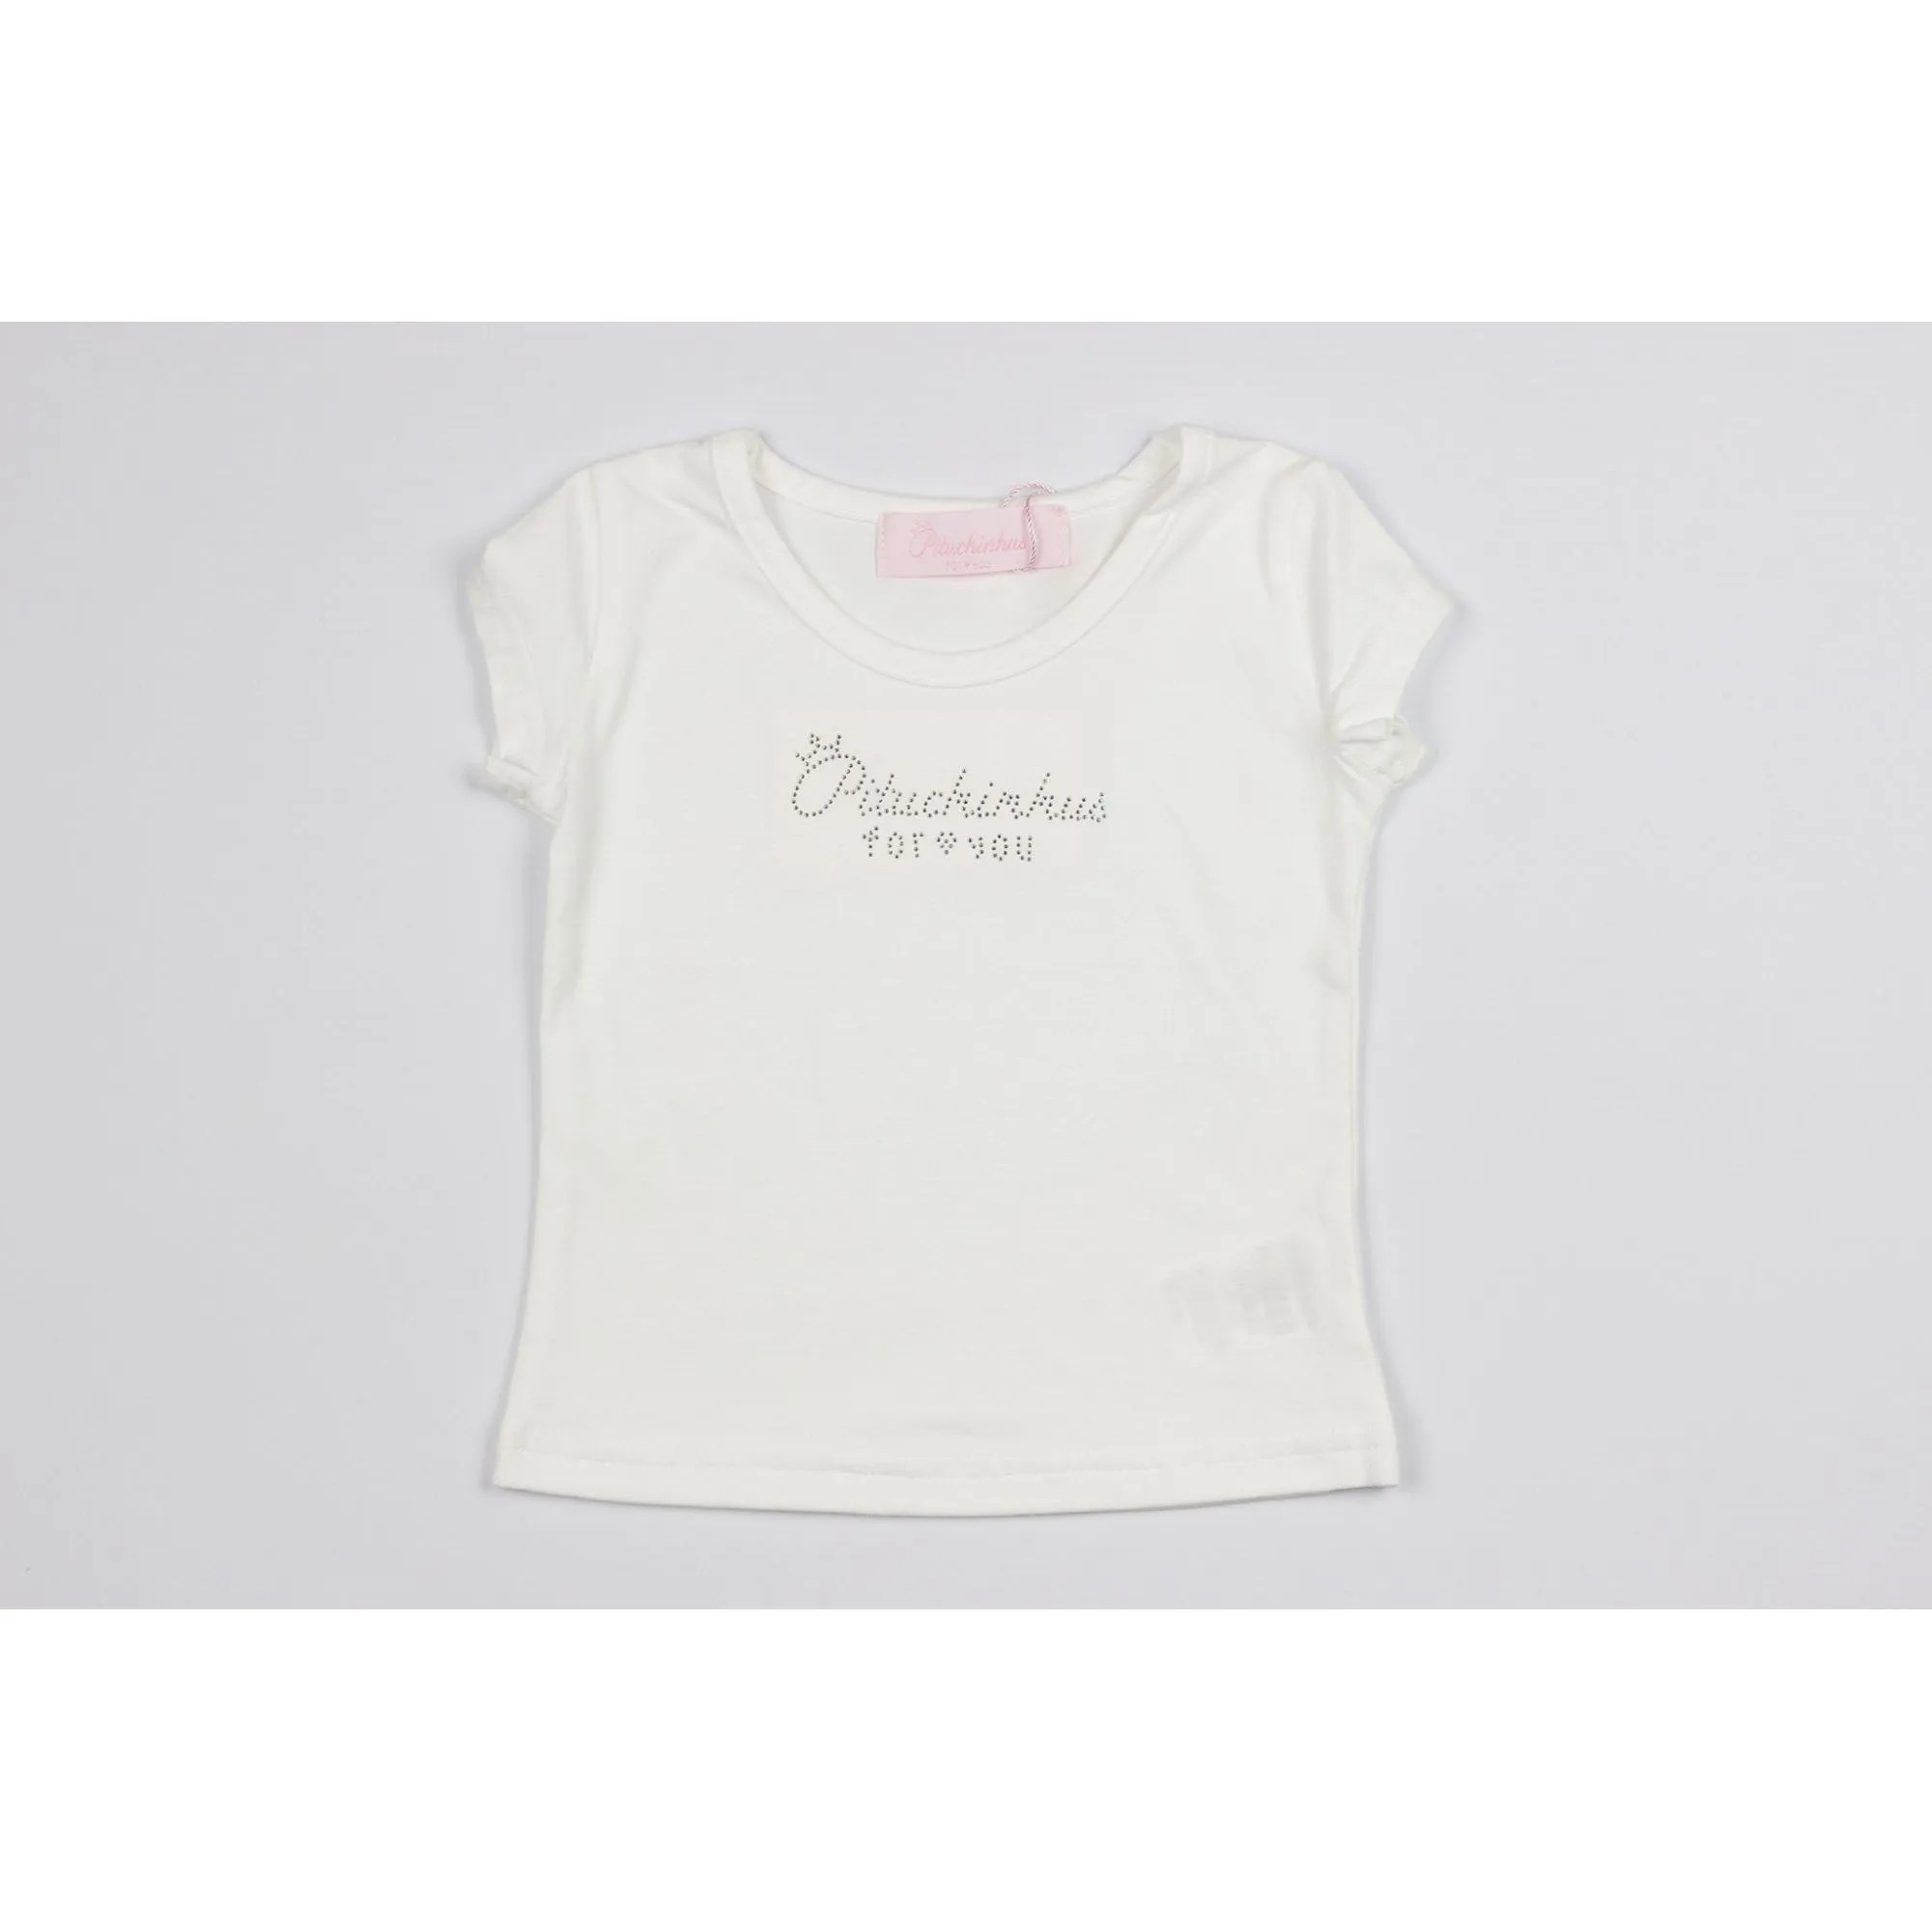 Baby Look Cotton Pituchinhus For You Pituchinhus Premium